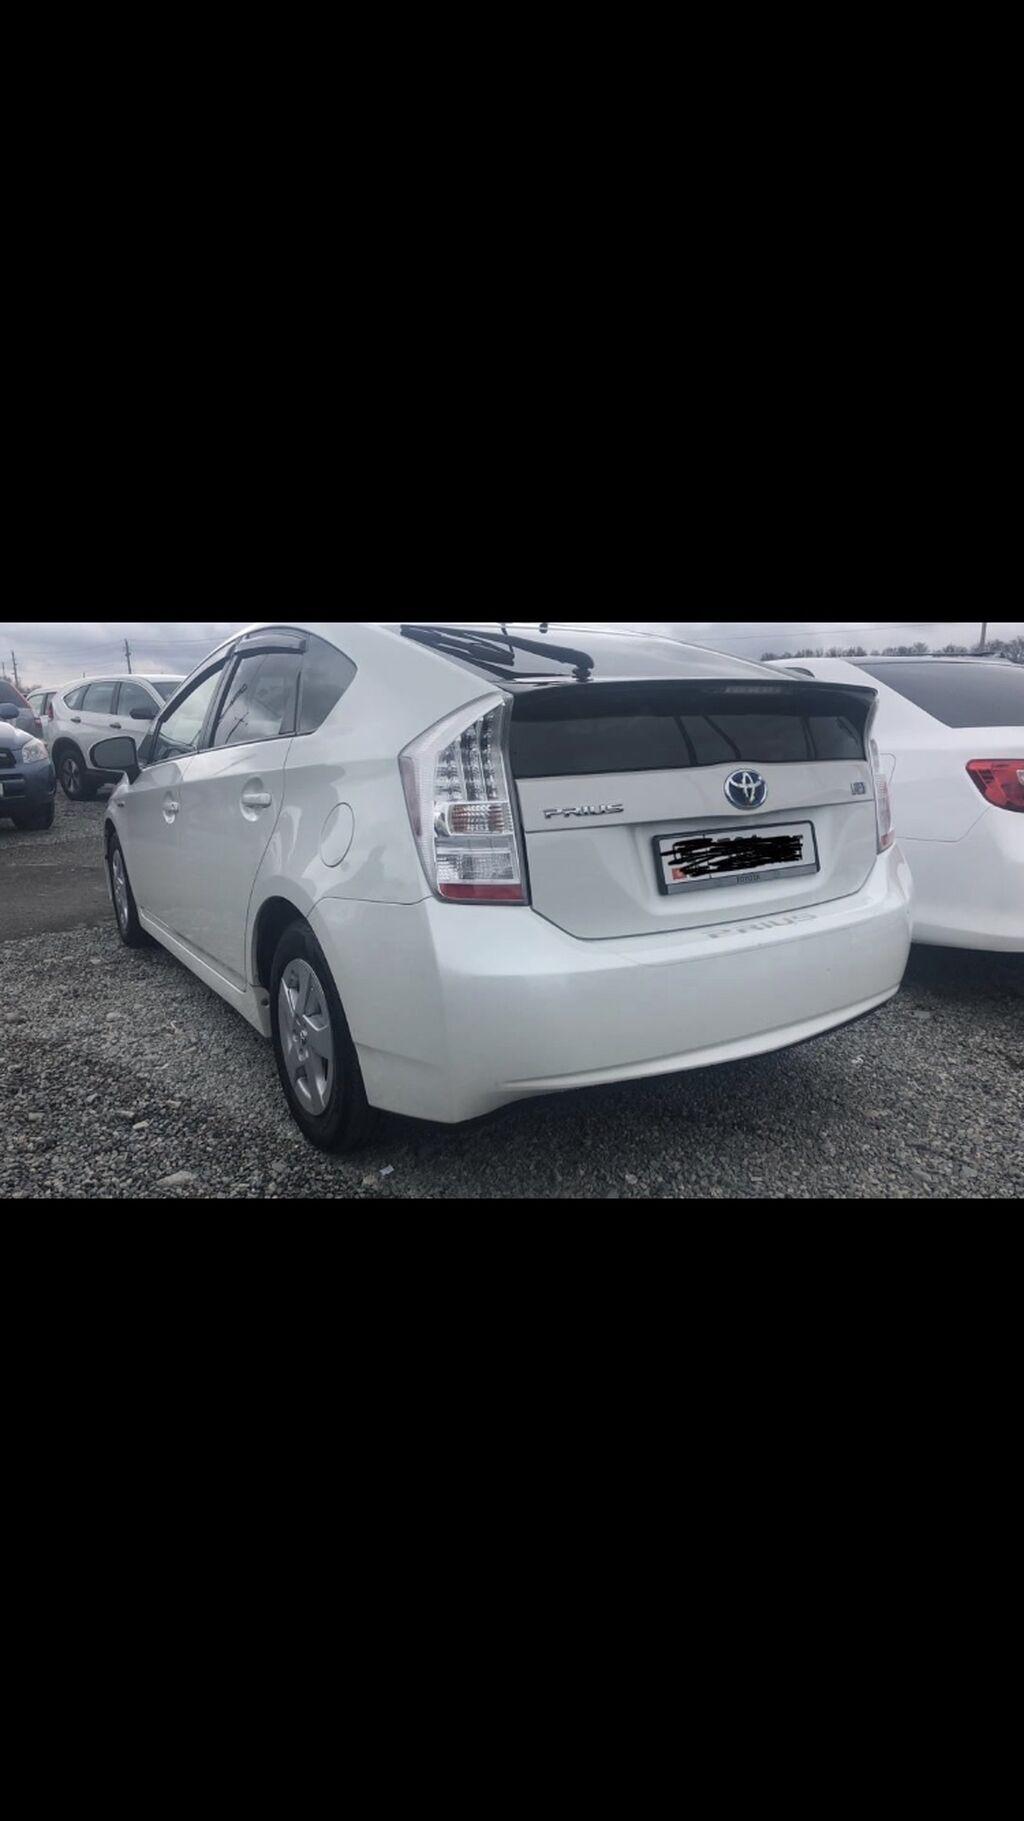 Toyota Prius 1.8 л. 2011 | 165598 км: Toyota Prius 1.8 л. 2011 | 165598 км